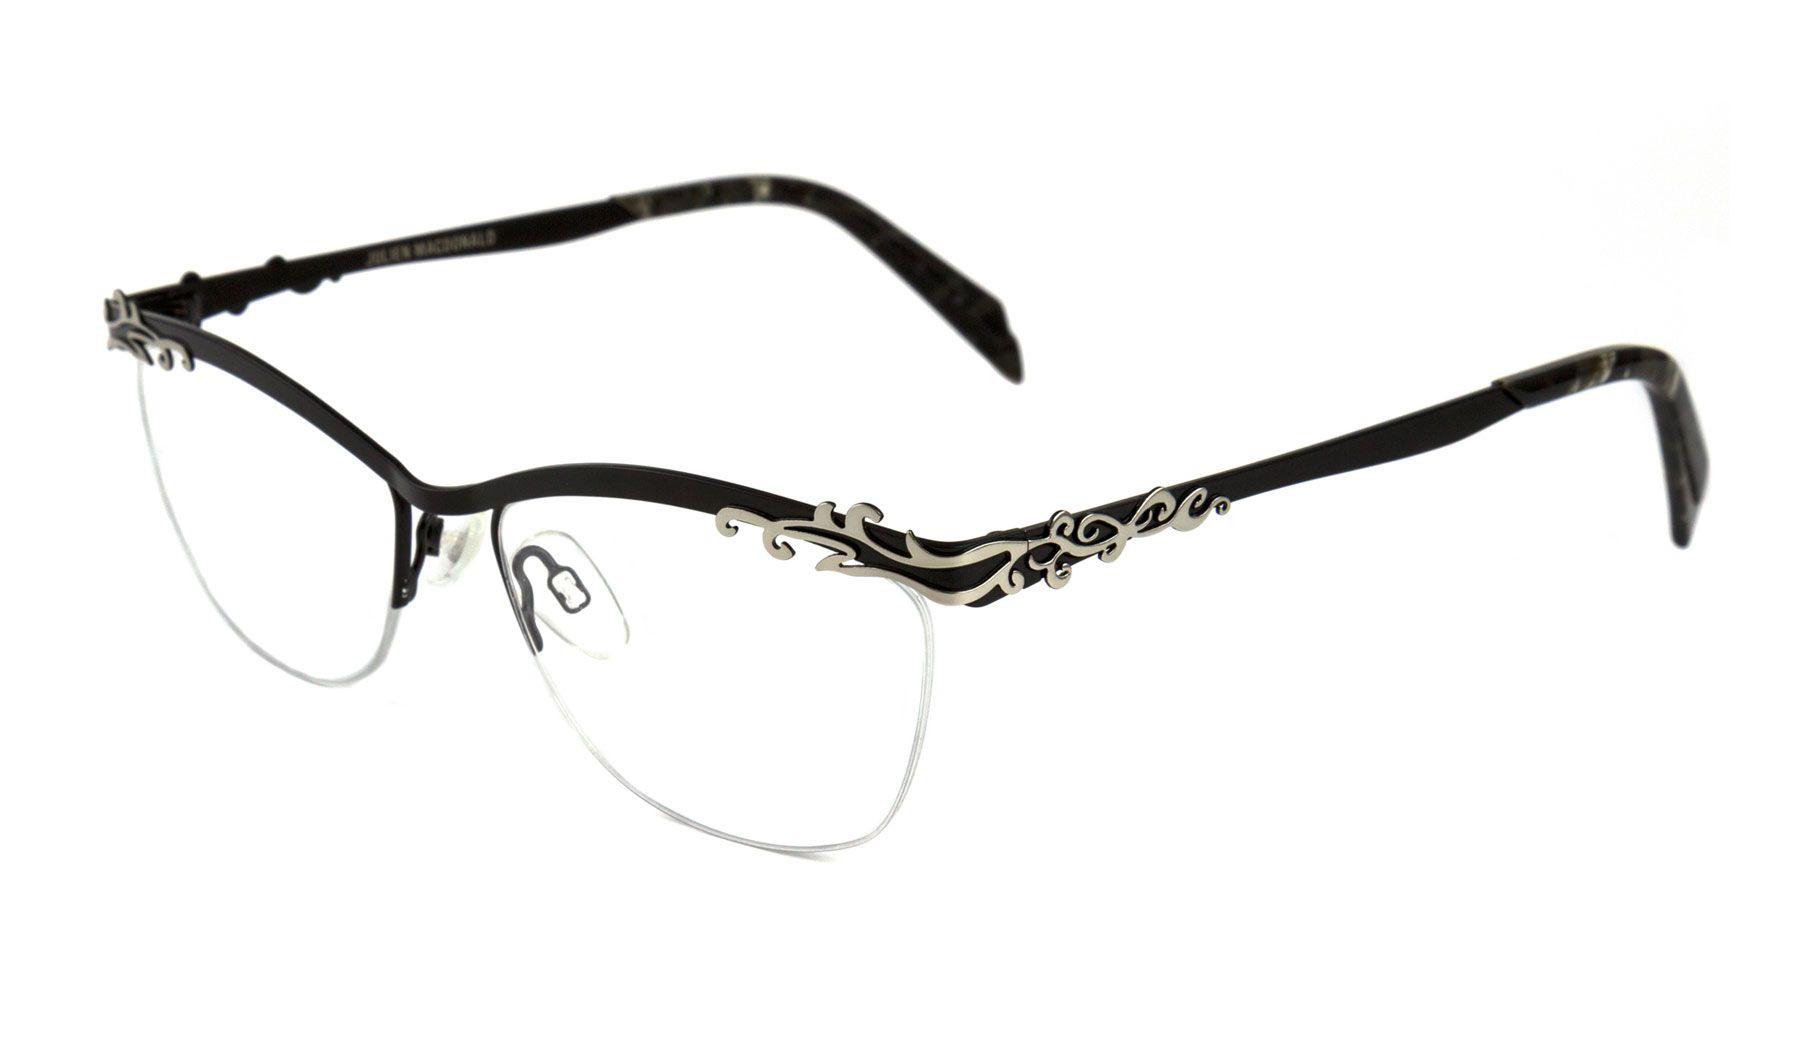 Julien Macdonald glasses